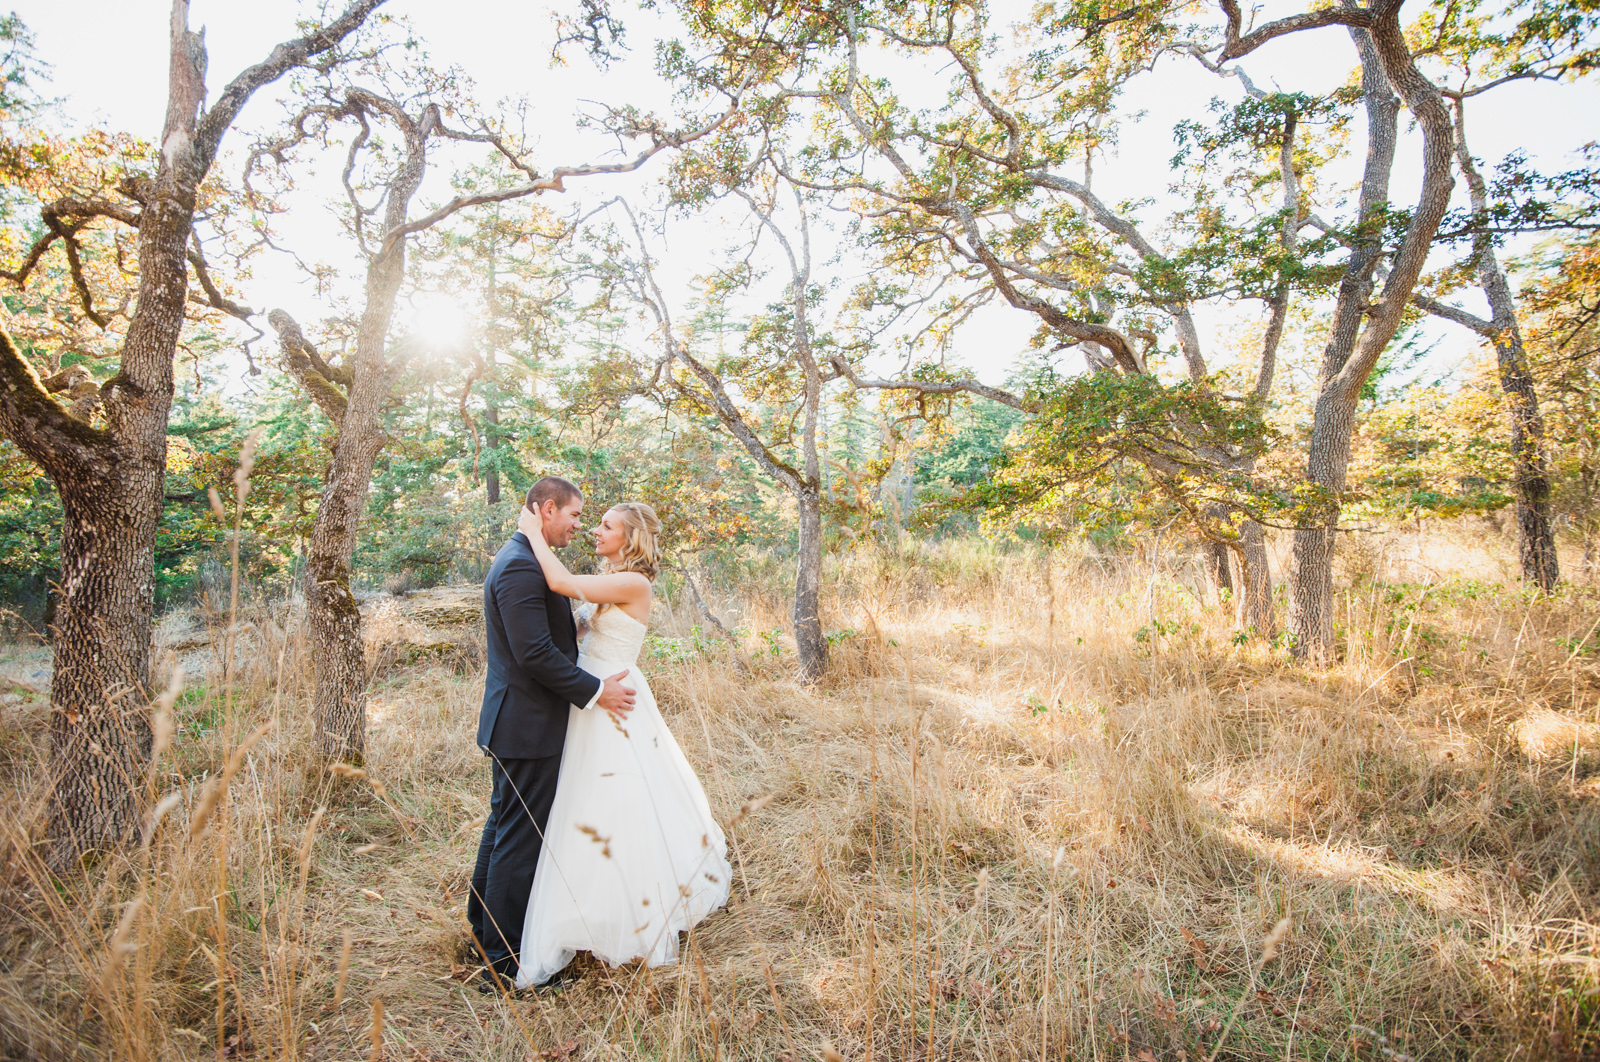 victoria-wedding-photographers-royal-colwood-golf-course-wedding-41.jpg